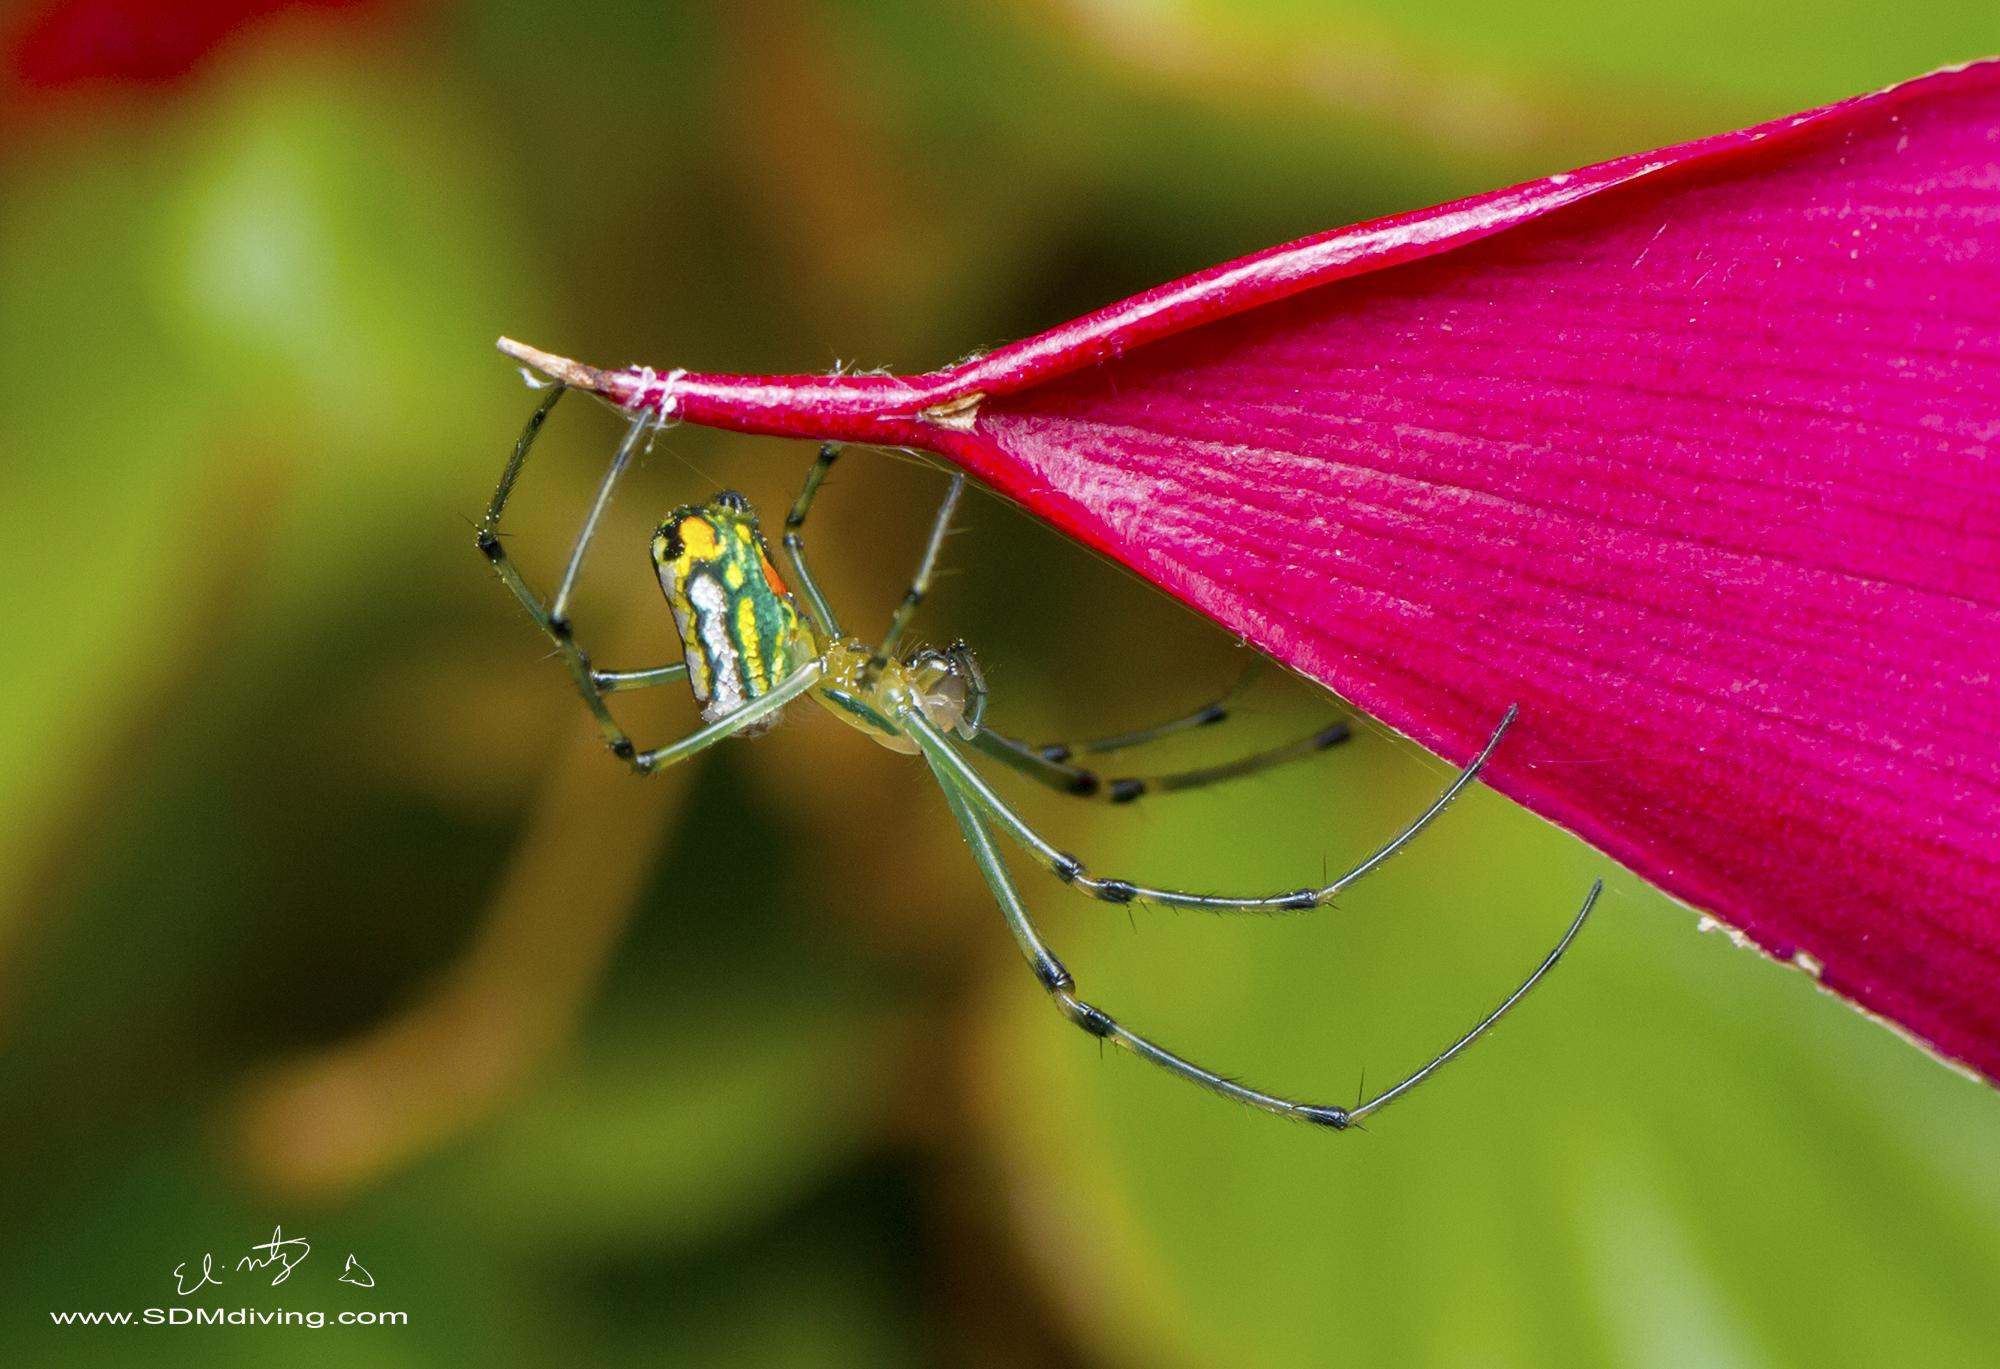 2. Orchard Spider